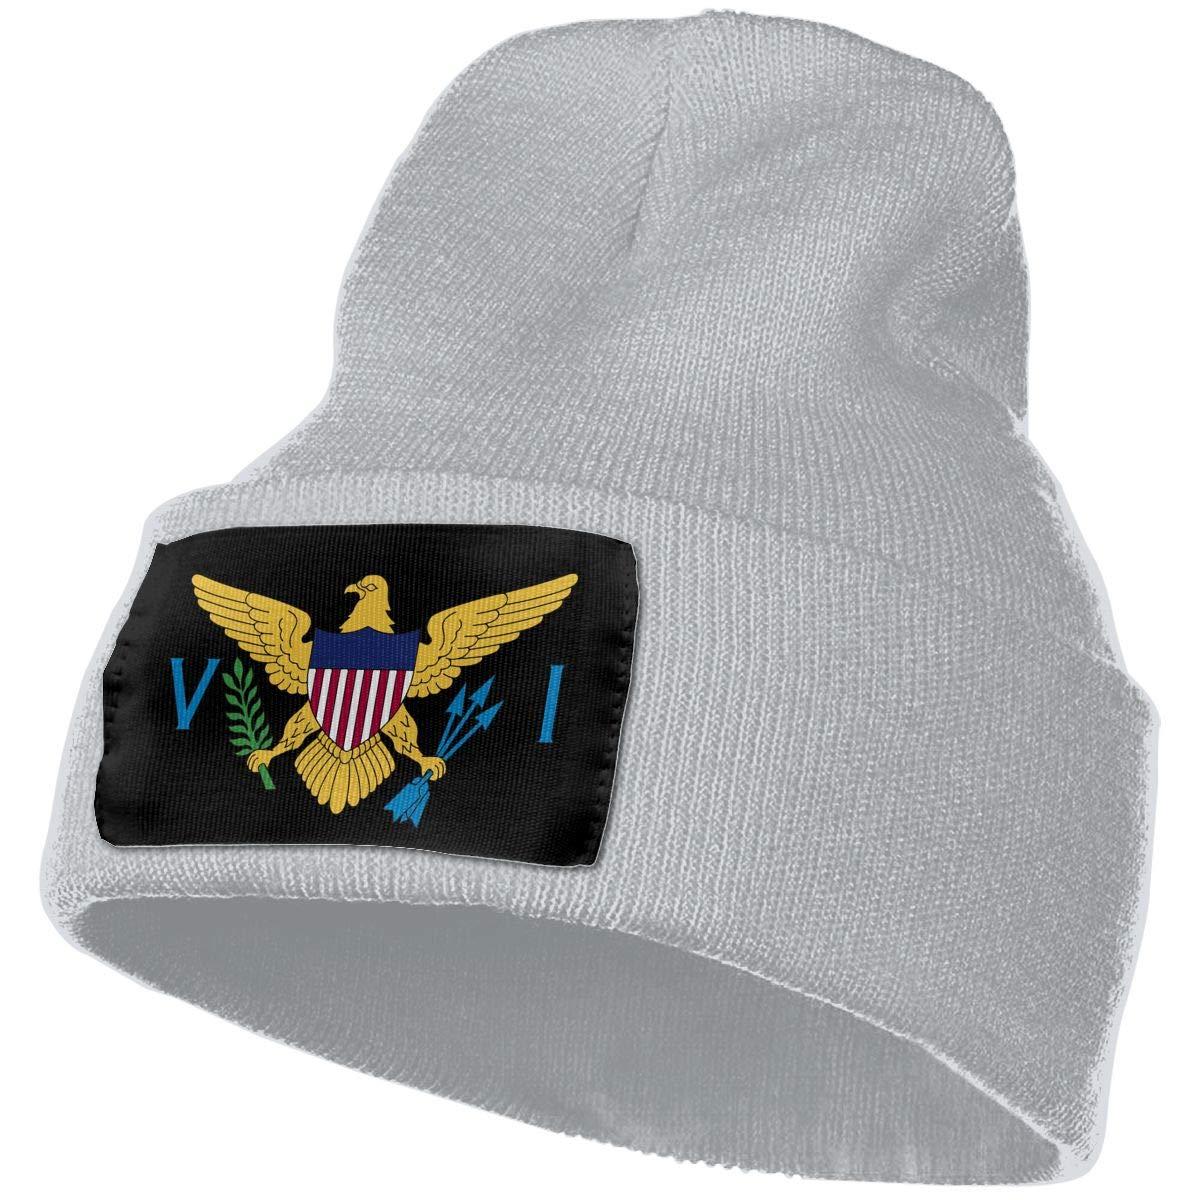 COLLJL-8 Unisex US Virgin Islands Flag Outdoor Stretch Knit Beanies Hat Soft Winter Knit Caps